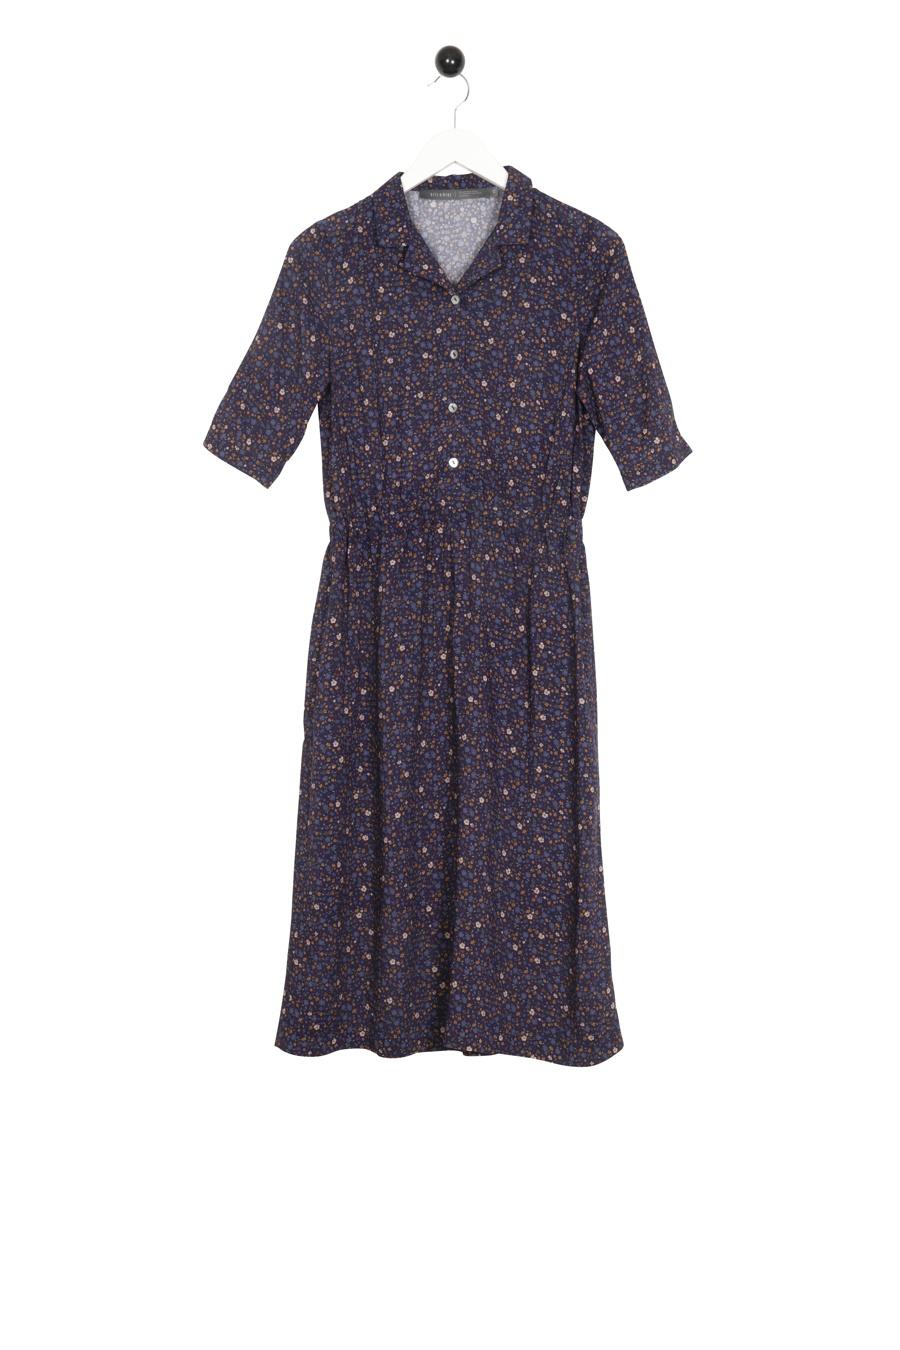 Simris Dress